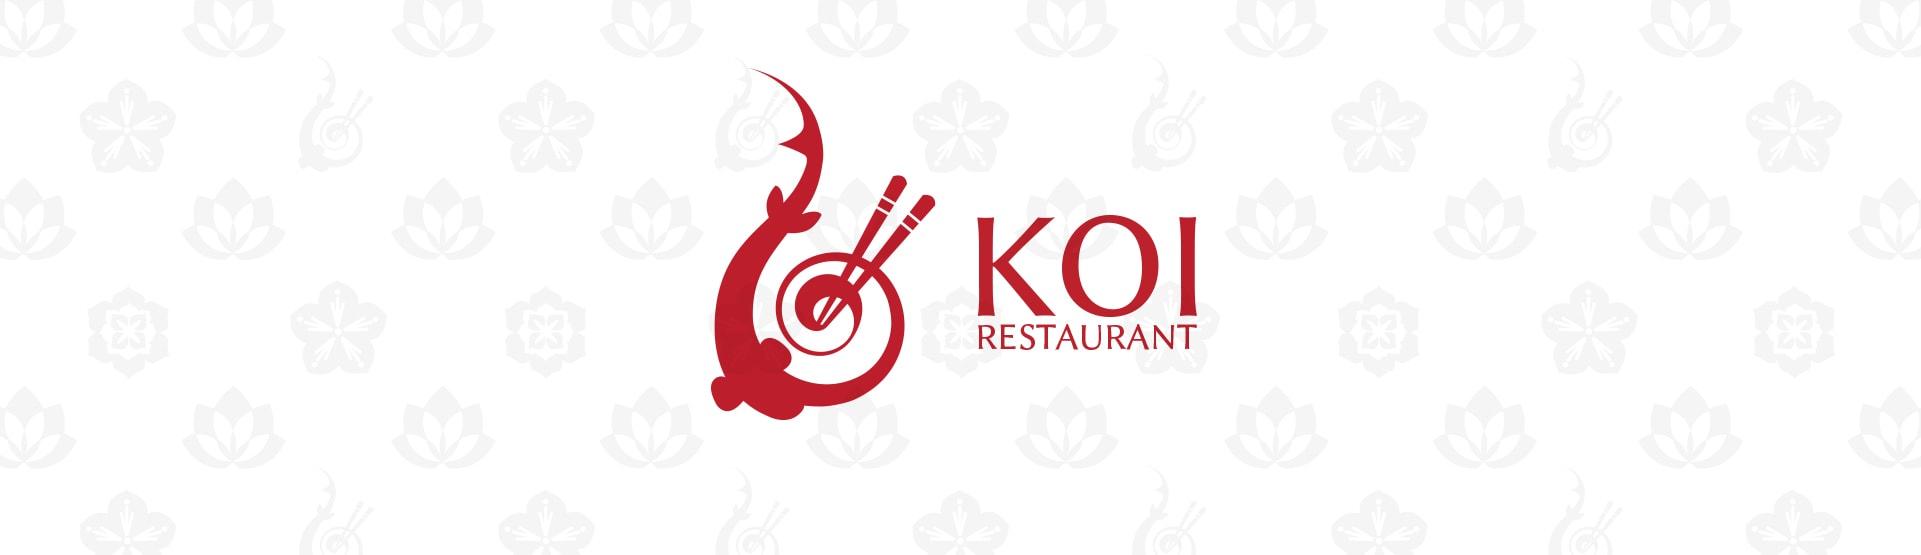 Koi featured image